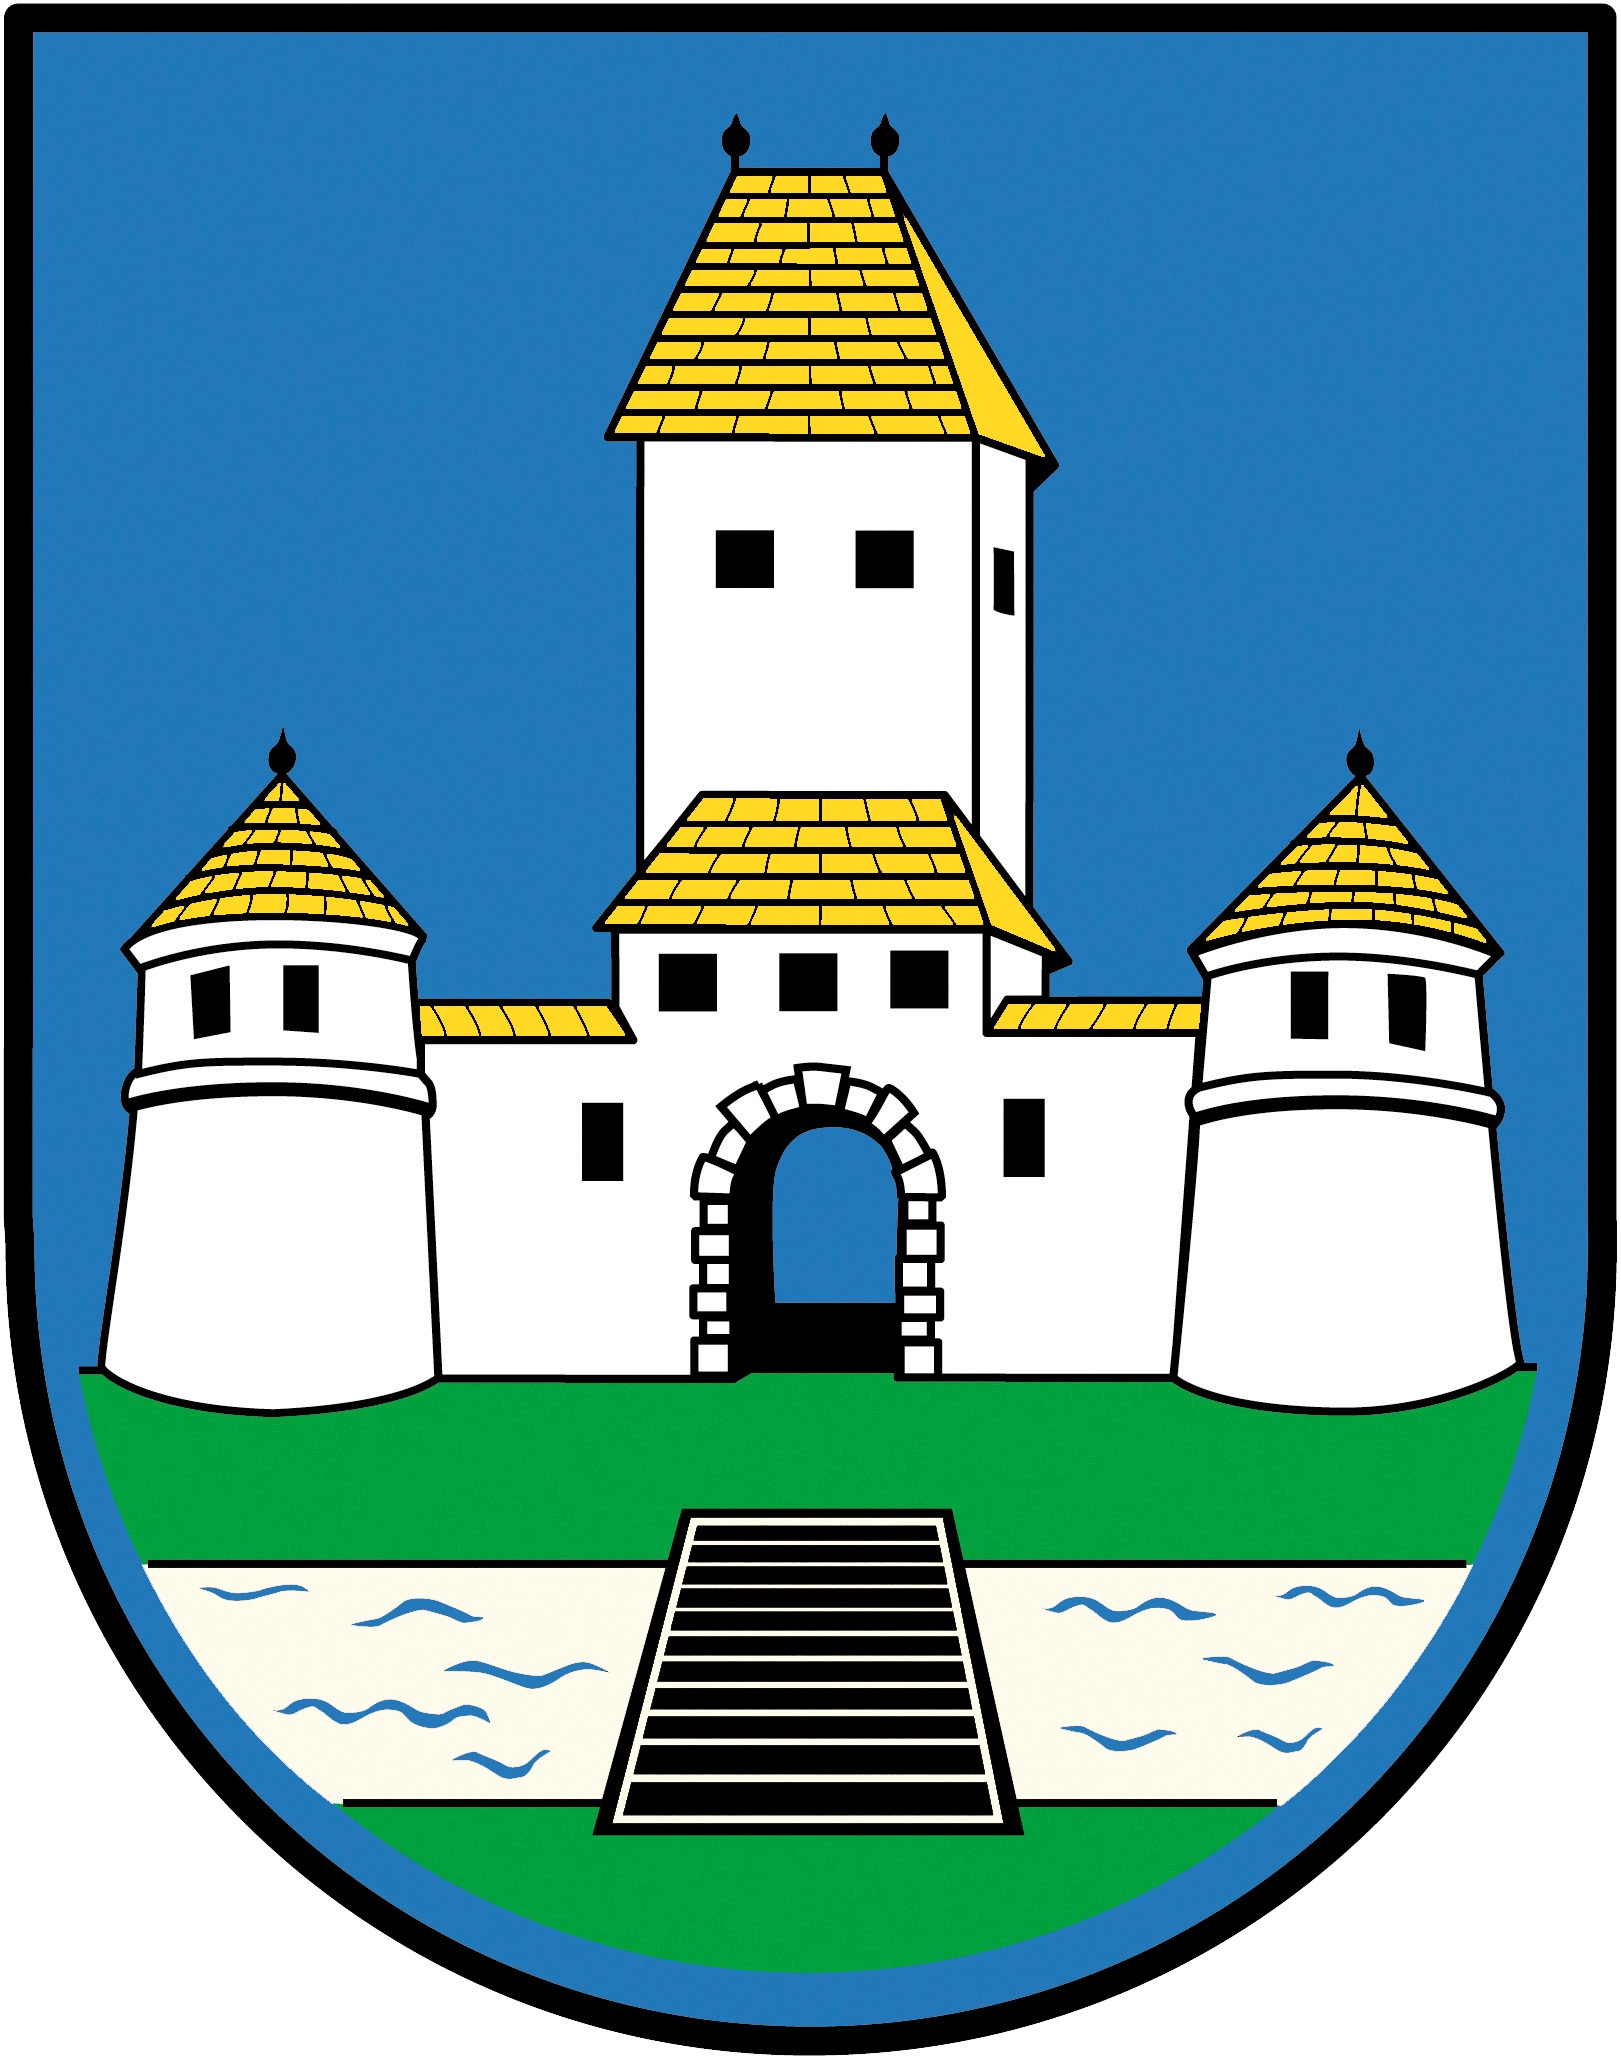 Wappen Stadtgemeinde Weiz